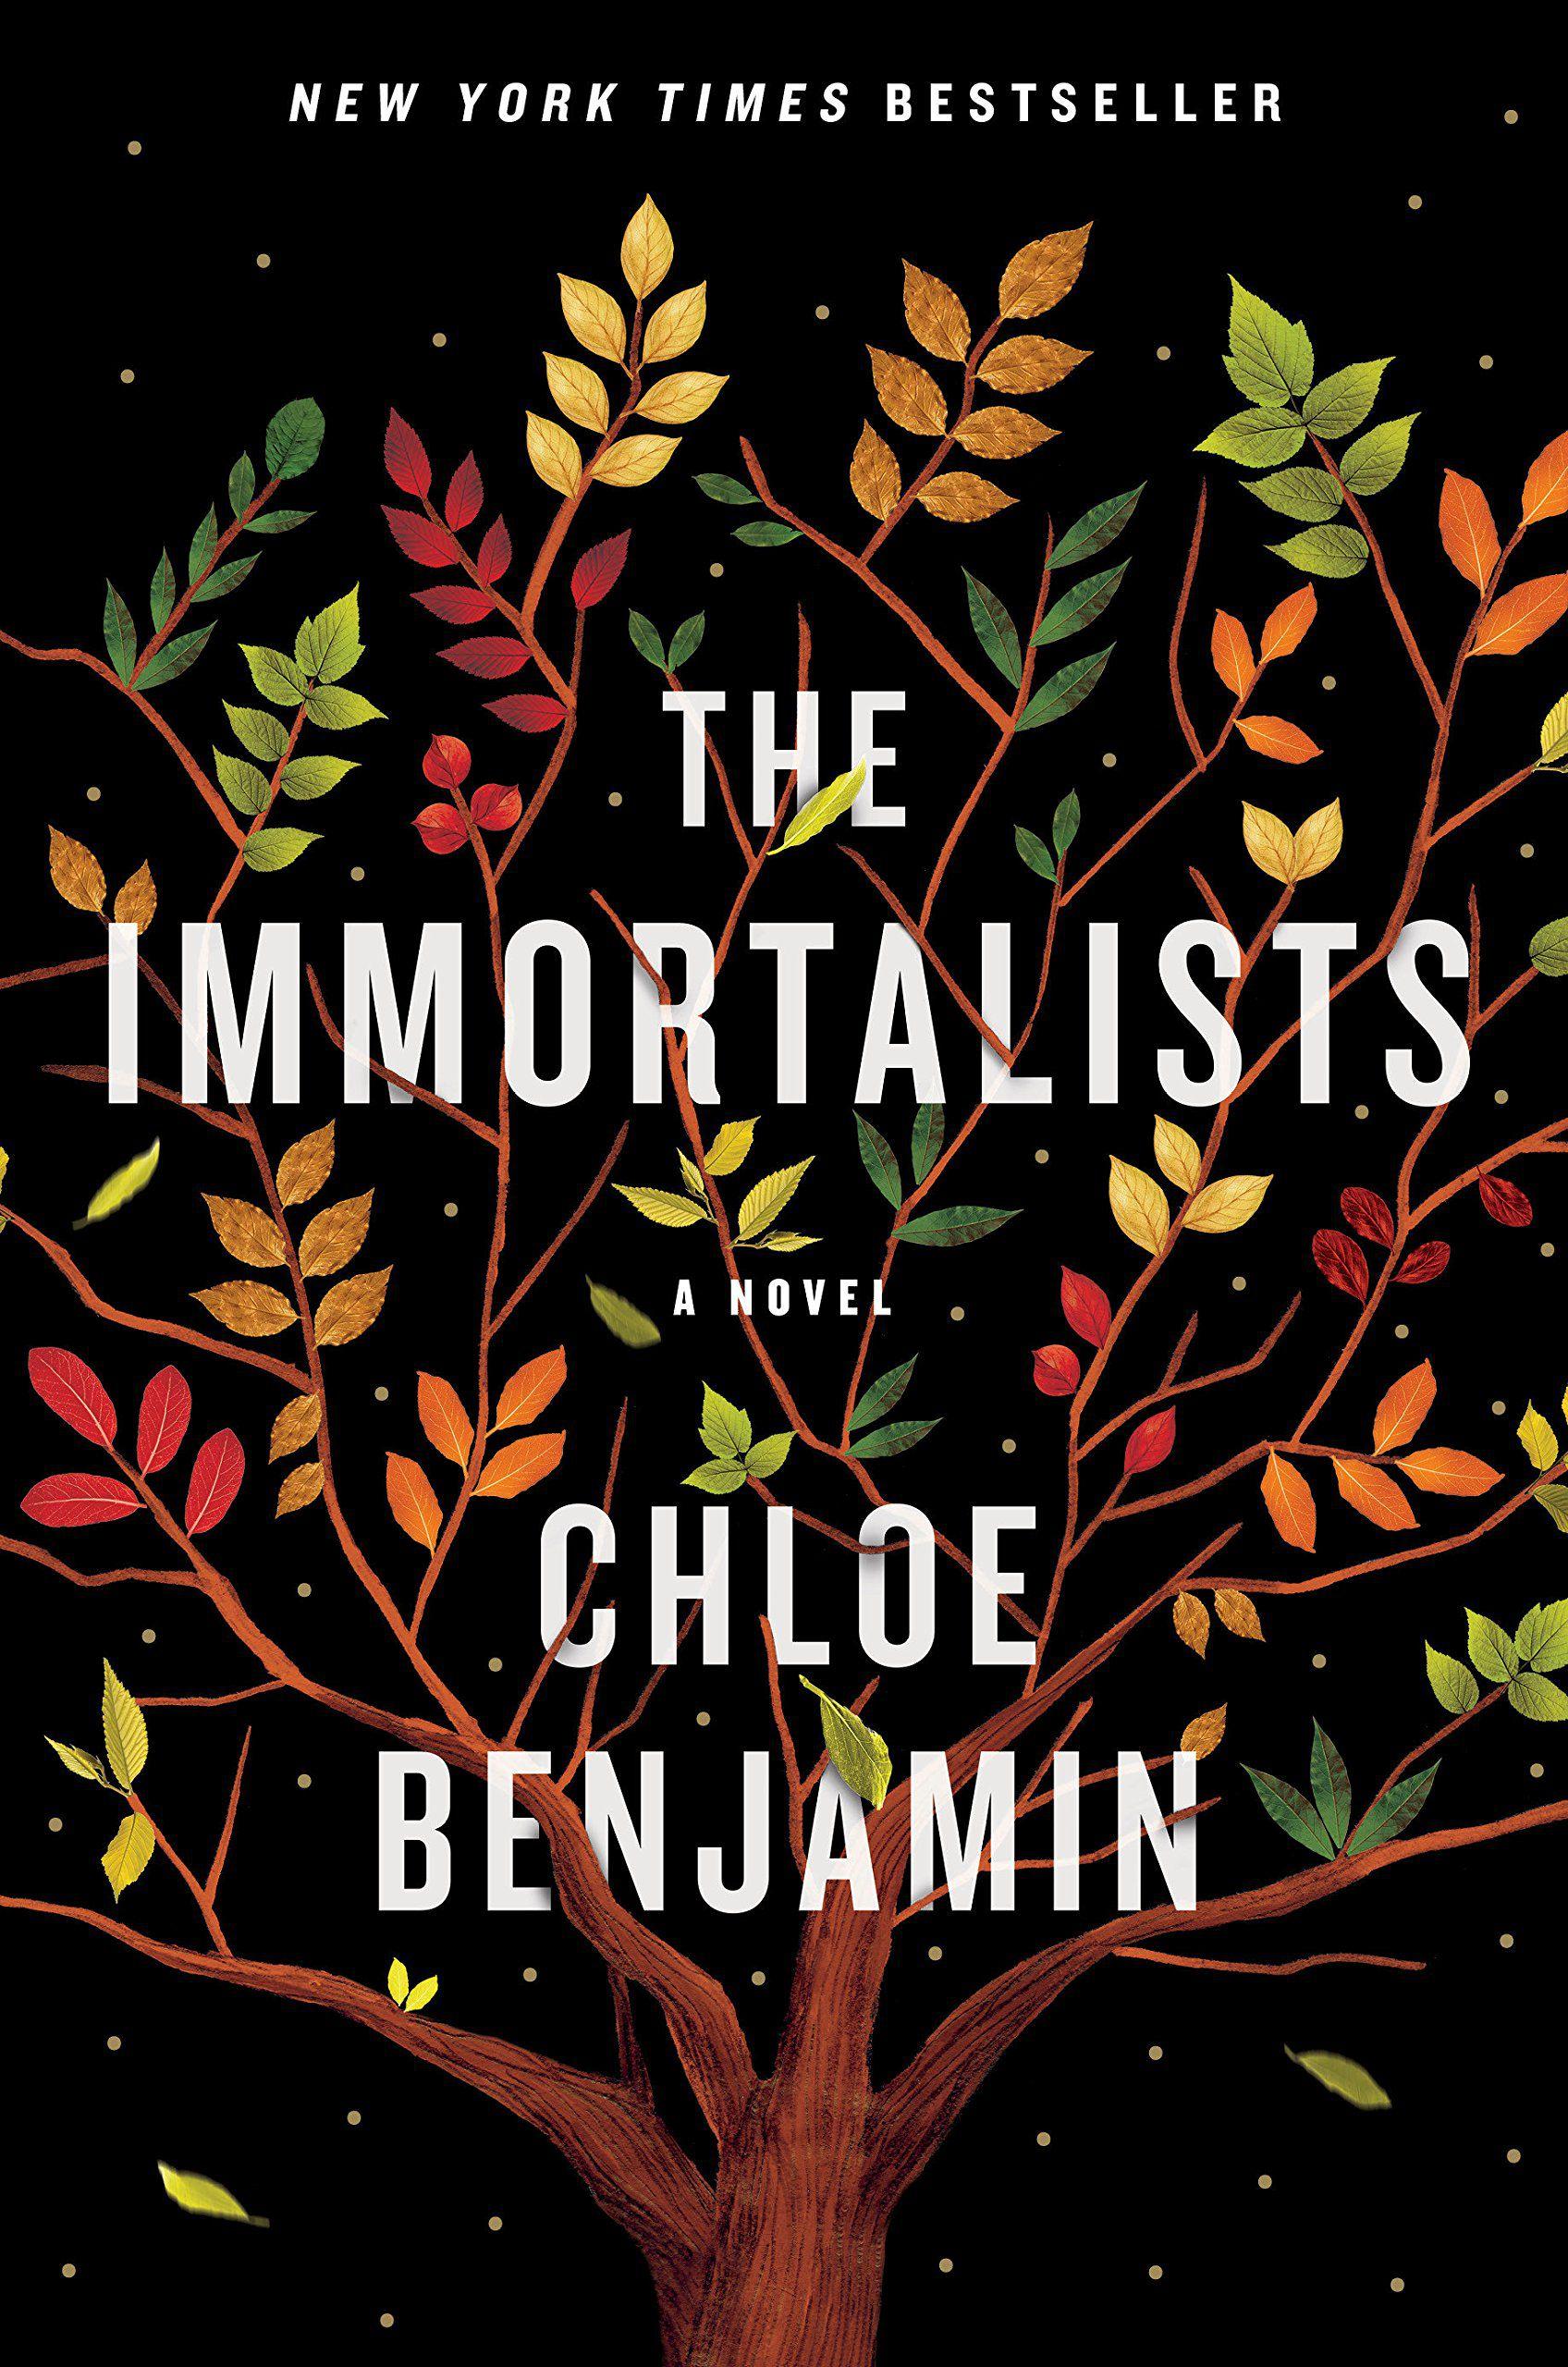 the immortalists by chloe benjamin.jpg.optimal